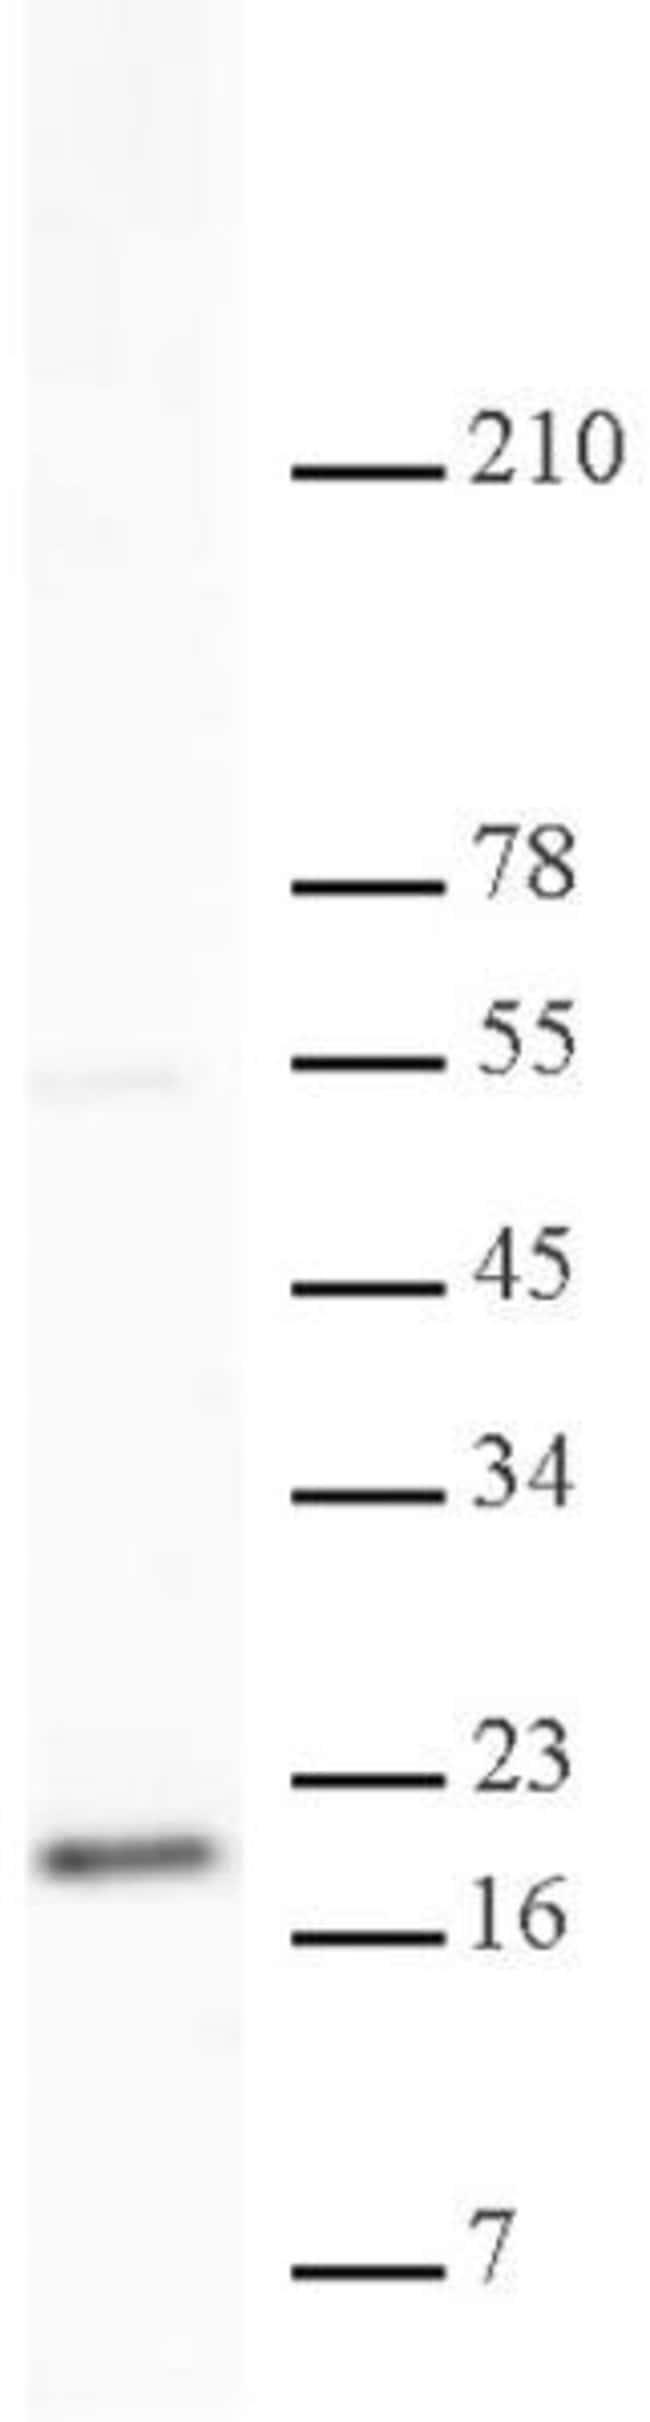 Histone H3K79me2 Rabbit anti-Human, Unconjugated, Polyclonal, Active Motif:Antibodies:Primary